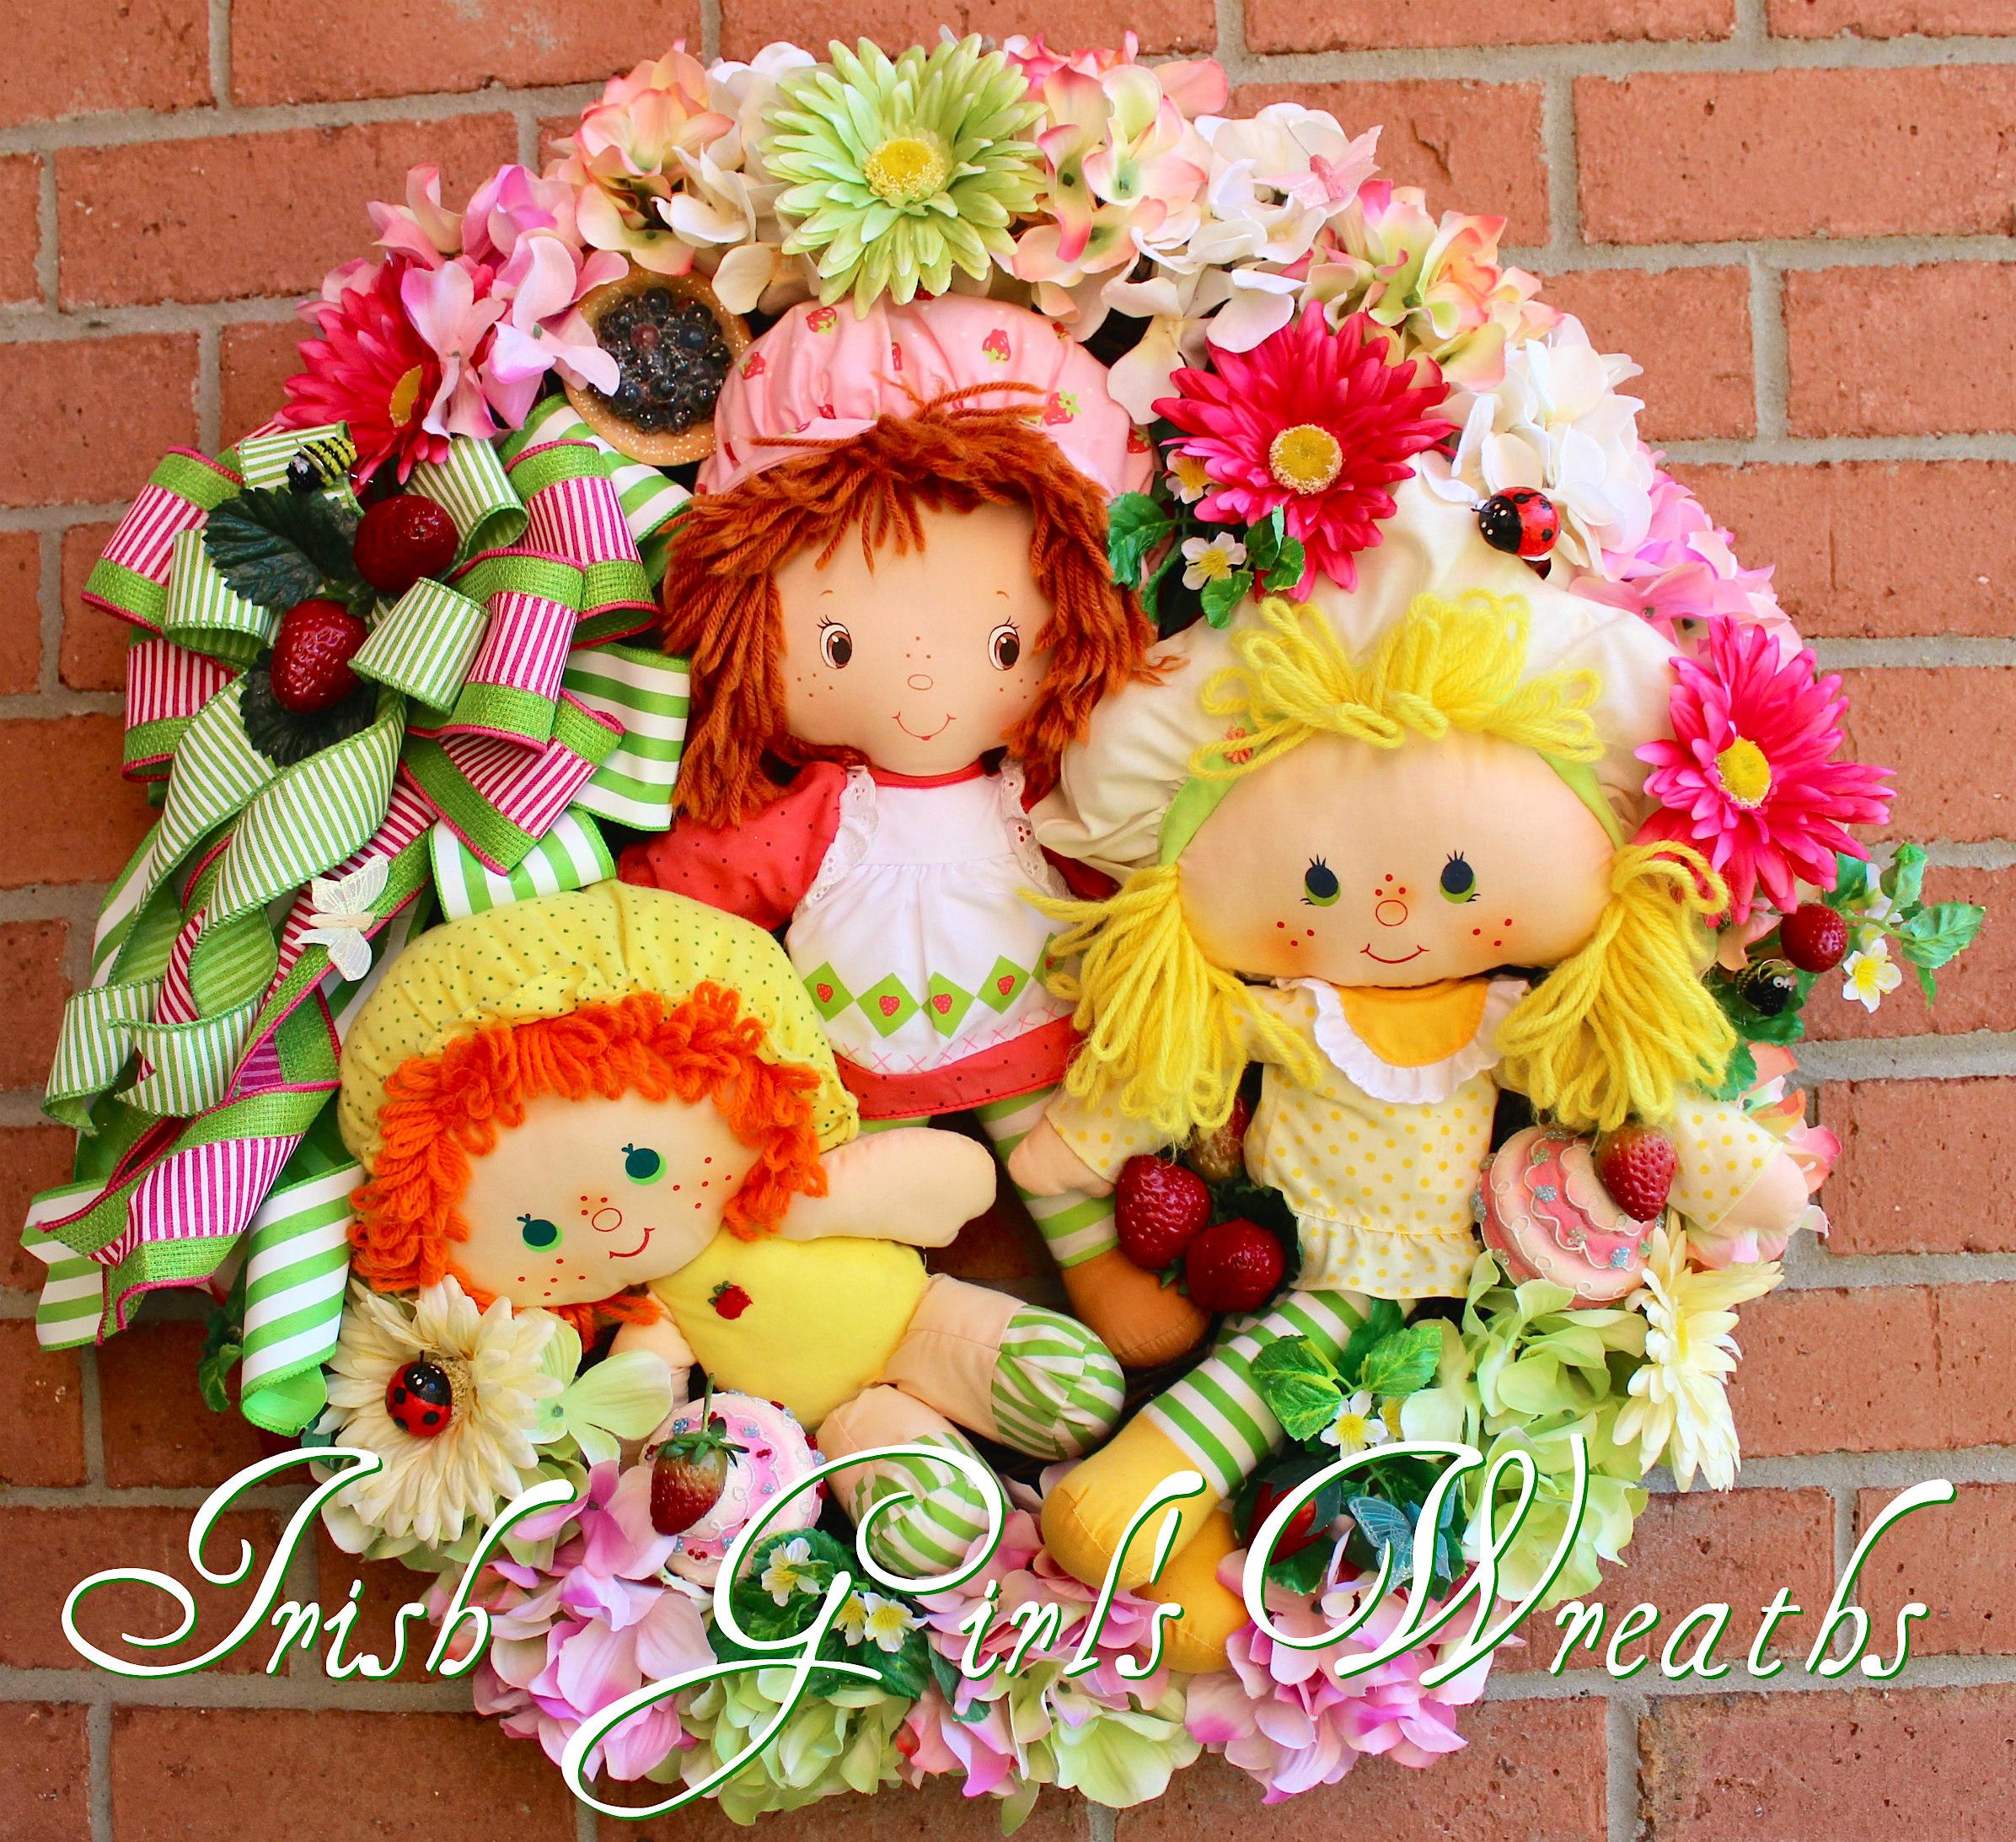 World Of Strawberry Shortcake Wreath, Custom for Dolores